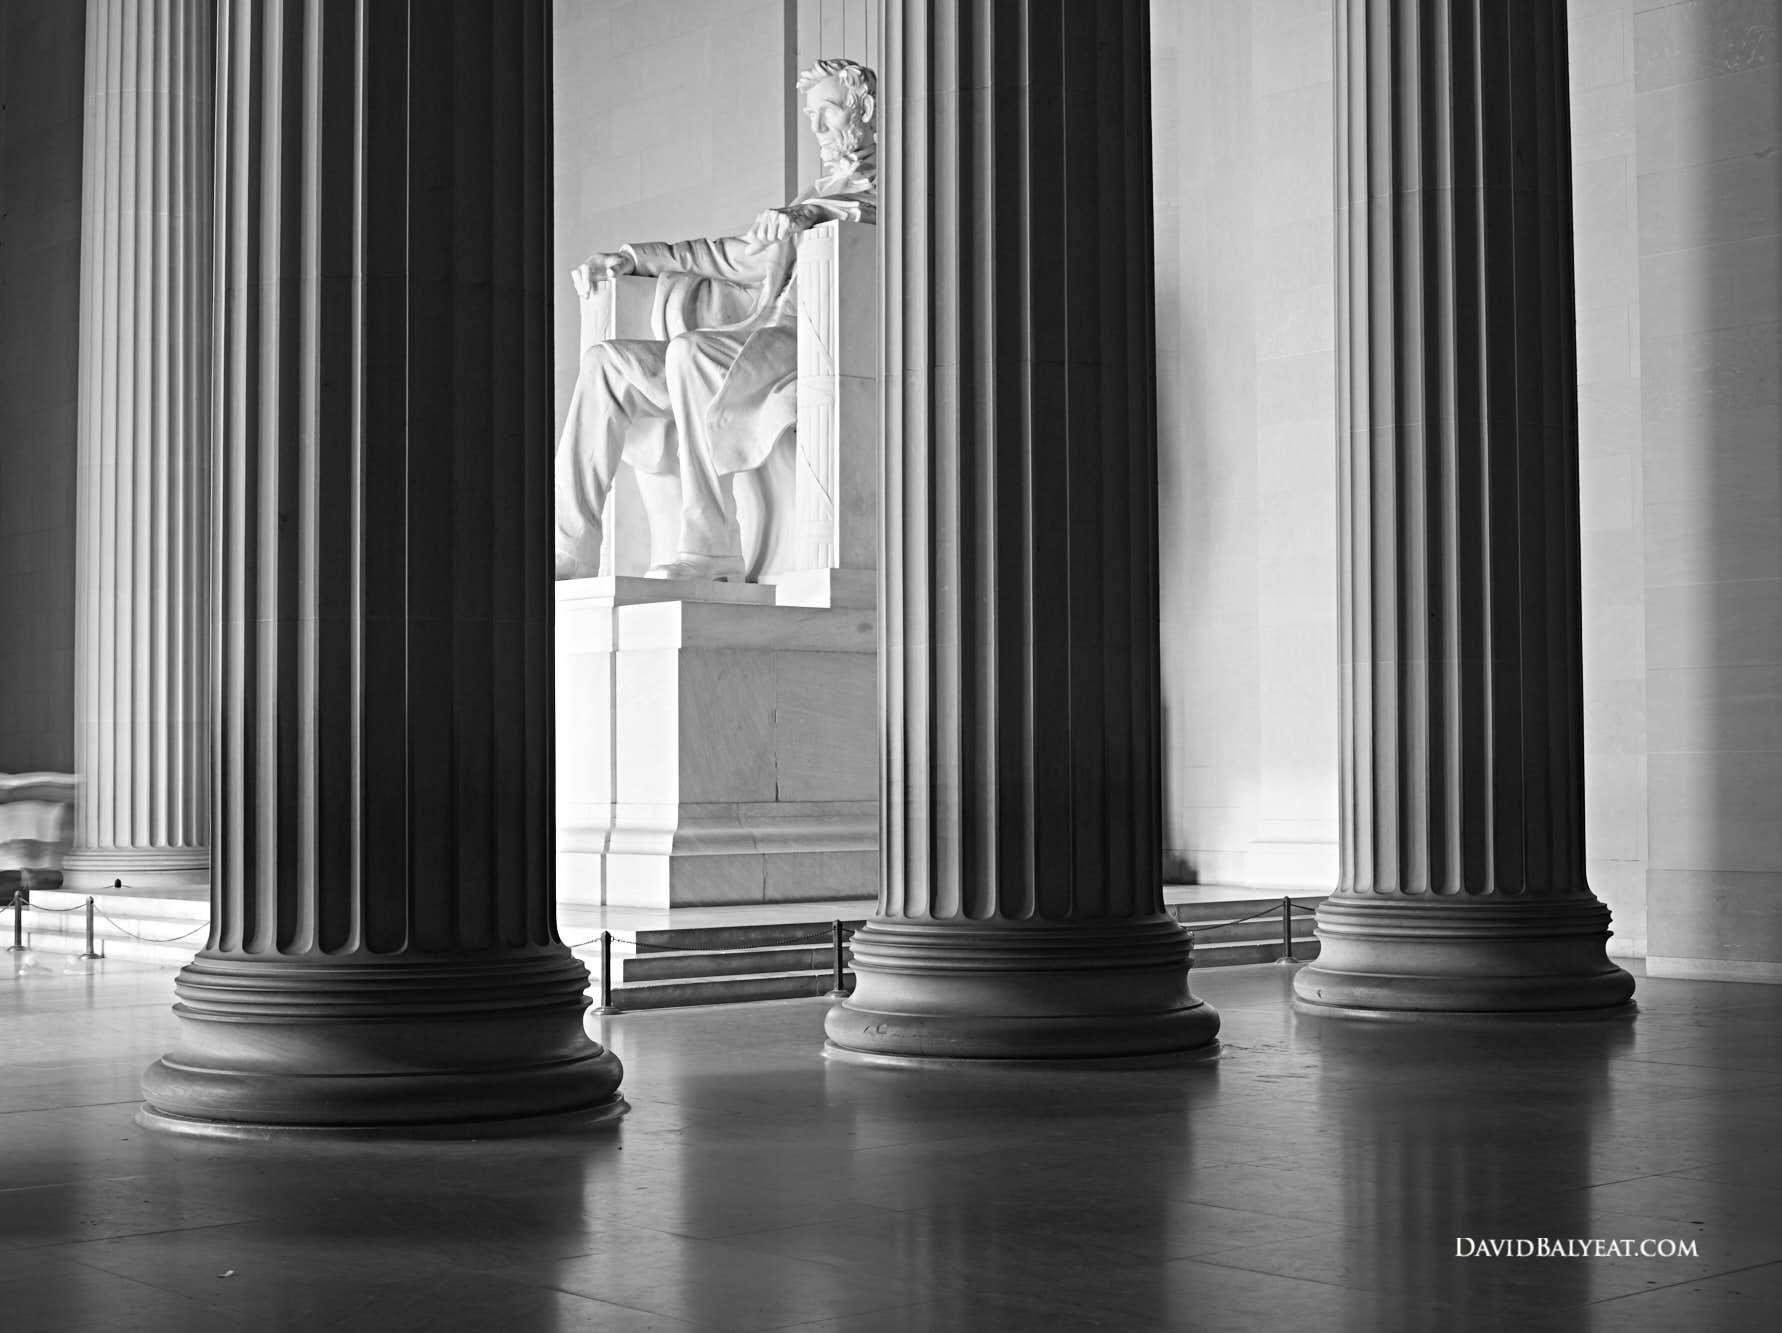 Lincoln Memorial Washington D.C. high-definition HD professional landscape photography